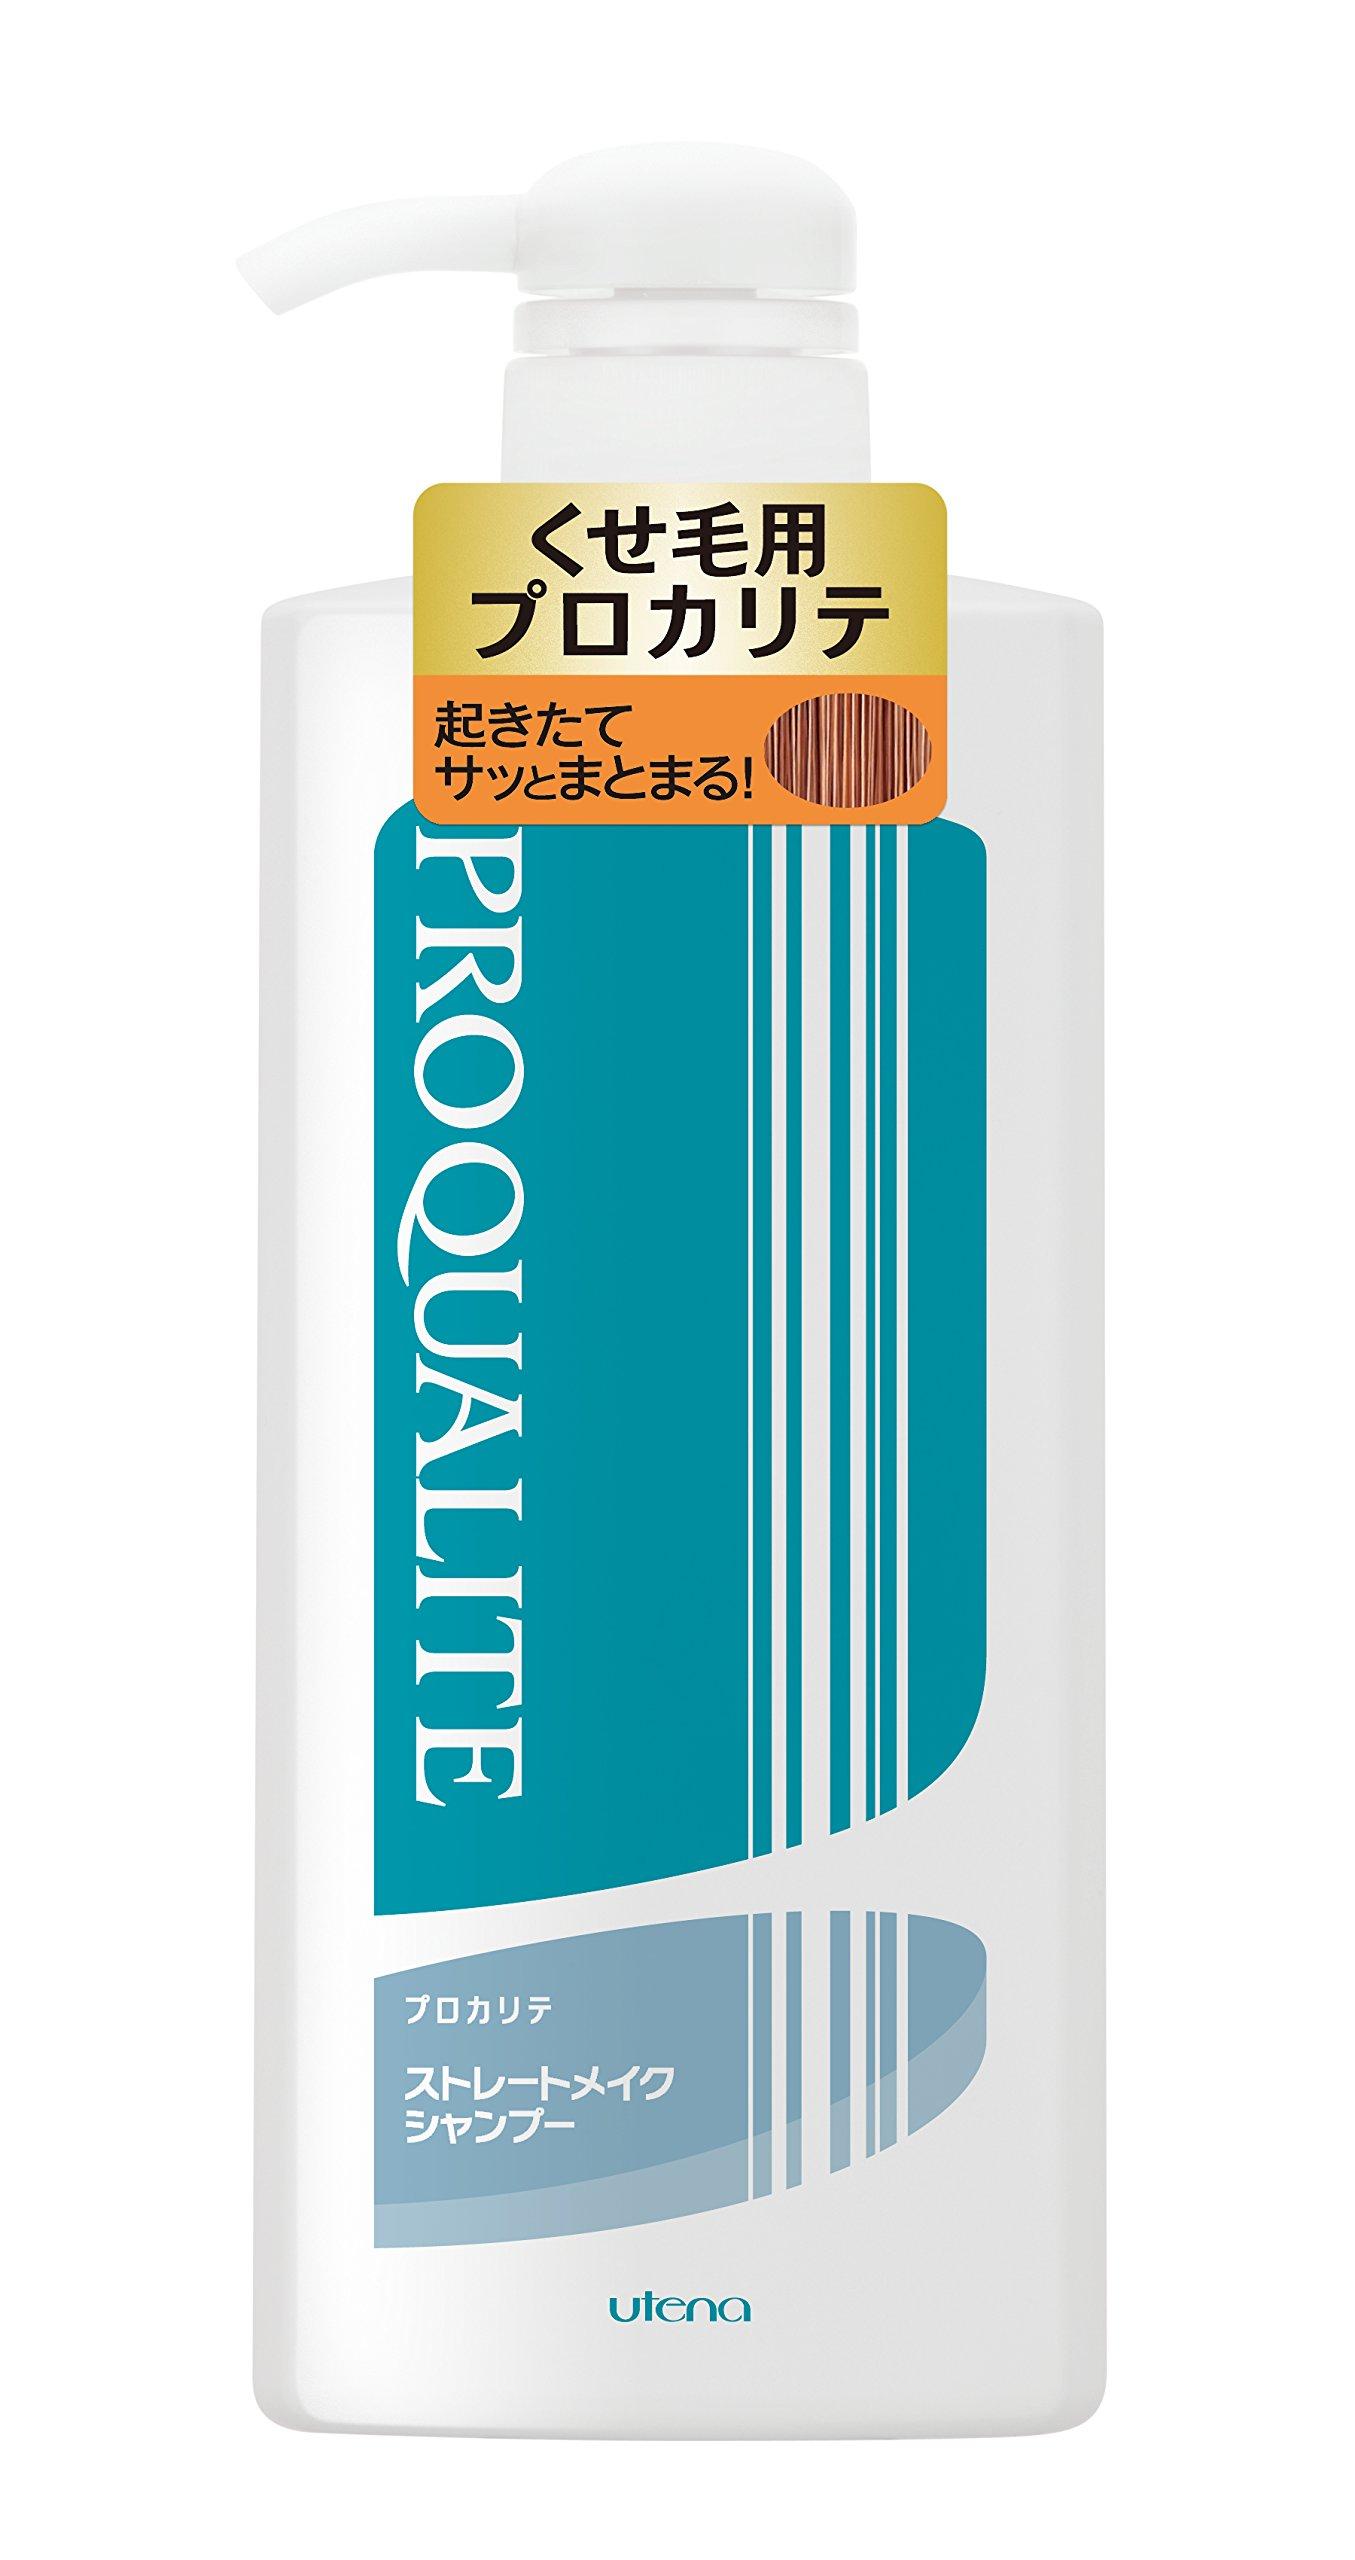 Self straight perm kit - Utena Proqualite Shampoo Straight Make Shampoo C Large 600ml For Frizz Hair Japan